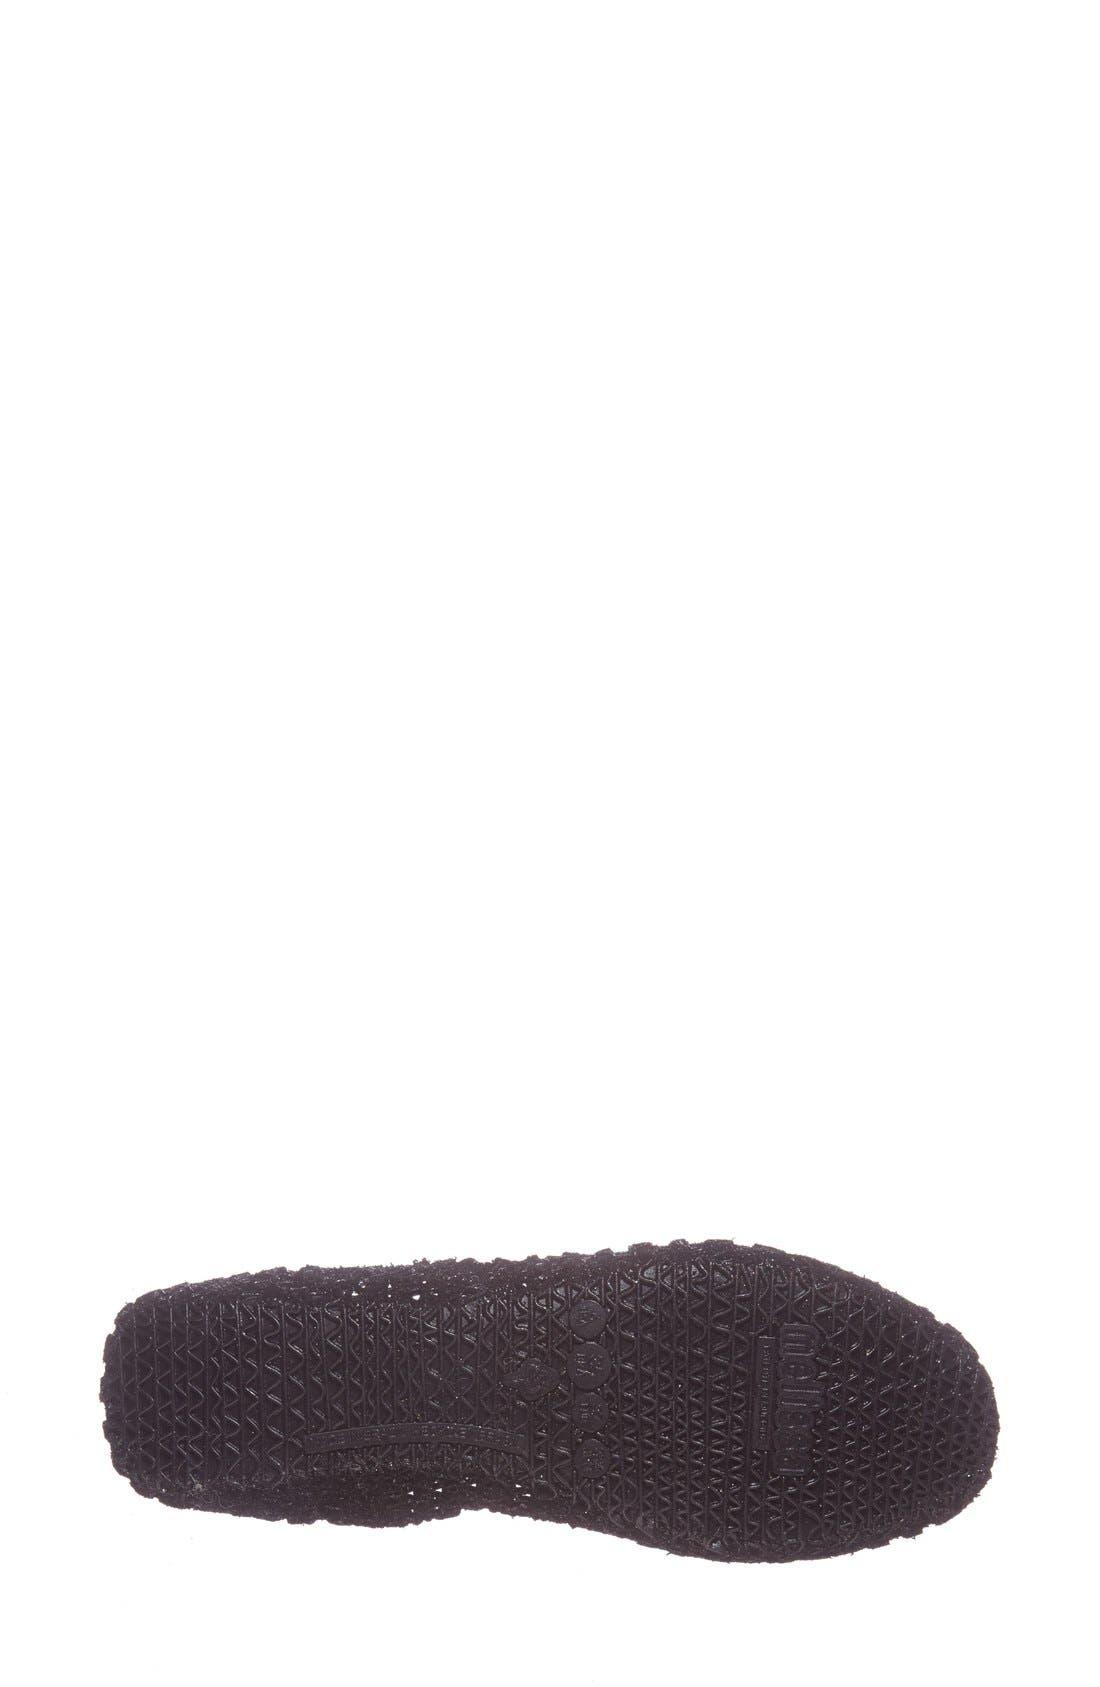 'Campana Papel VII' Jelly Flat,                             Alternate thumbnail 4, color,                             BLACK GLITTER